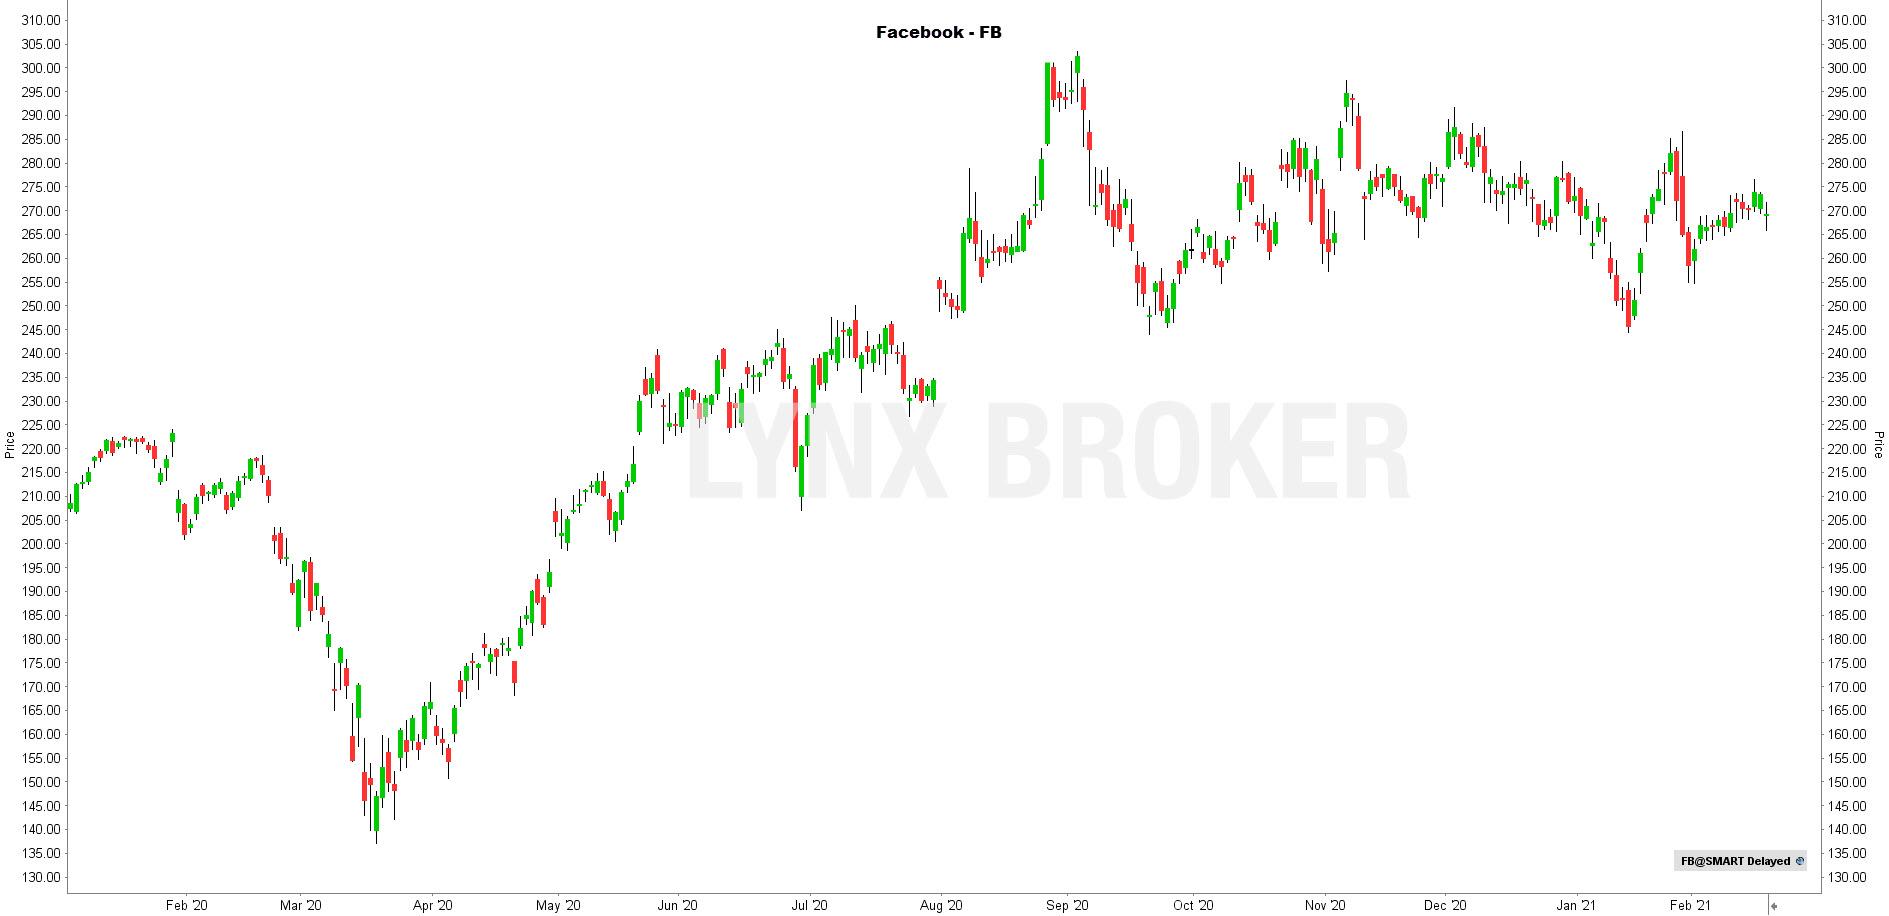 la chronique lynx broker 190221 - graphique Facebook